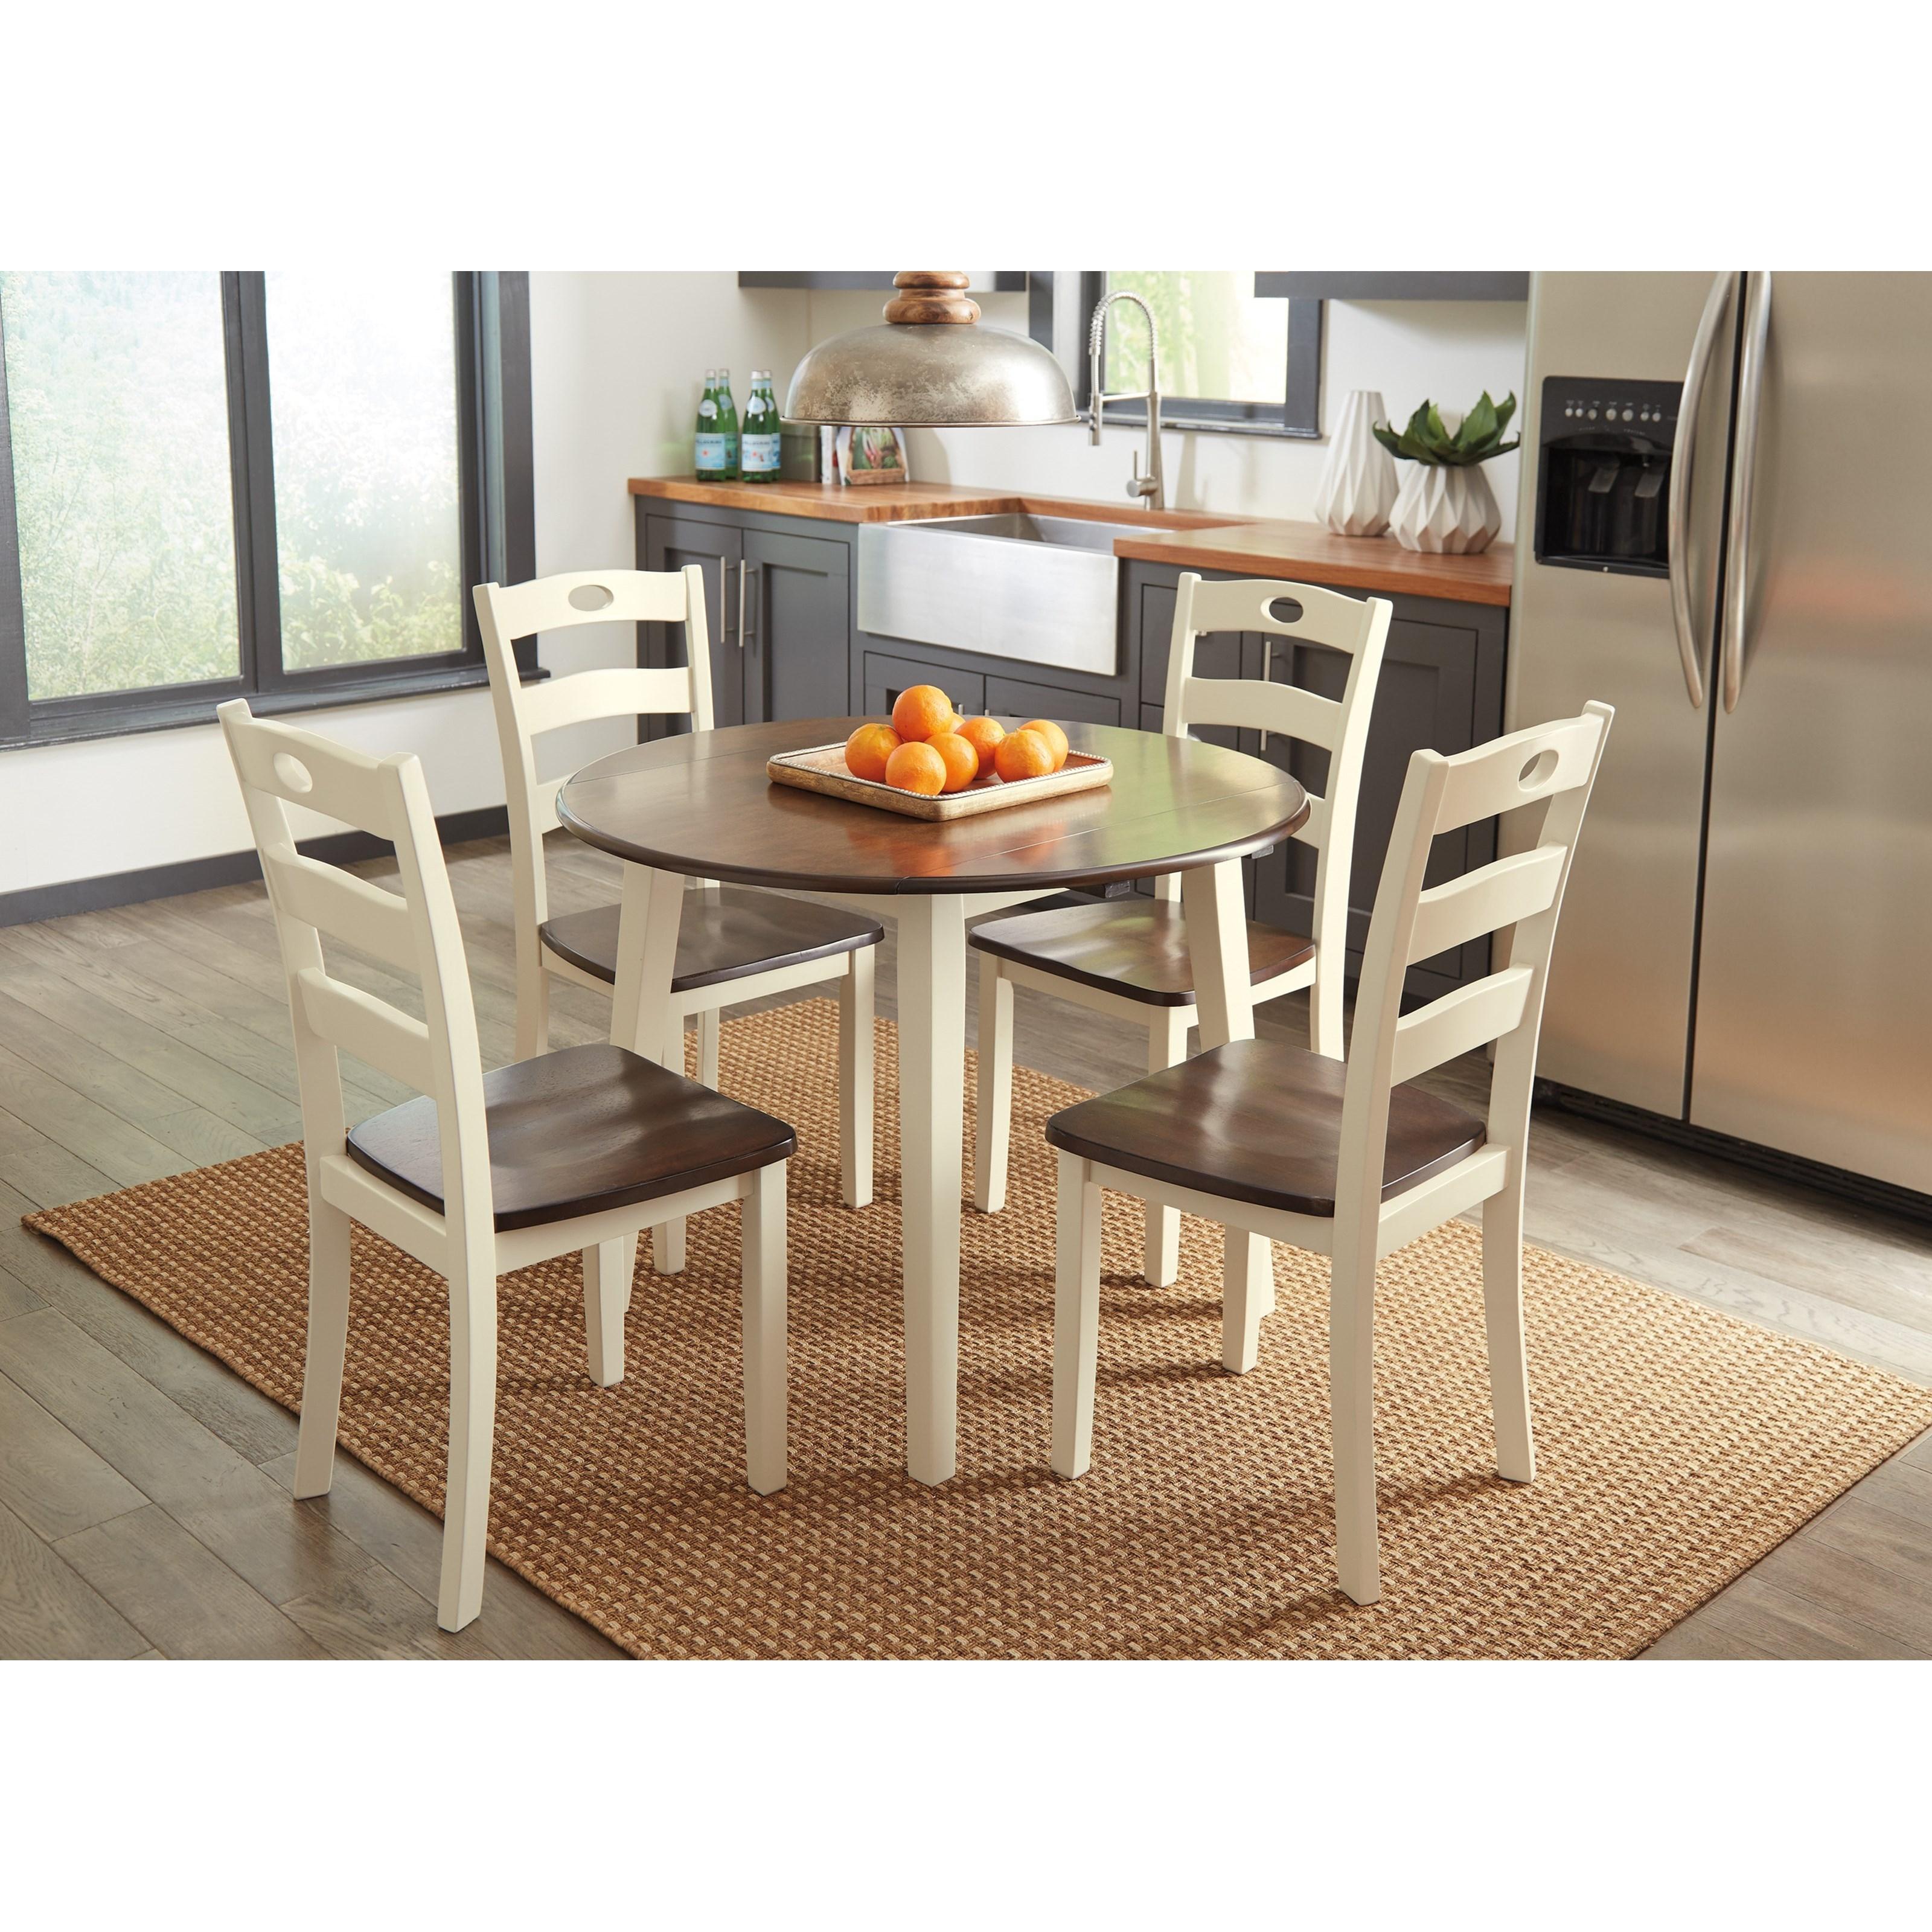 ashley signature design woodanville 5 piece round drop leaf table set dunk bright furniture. Black Bedroom Furniture Sets. Home Design Ideas